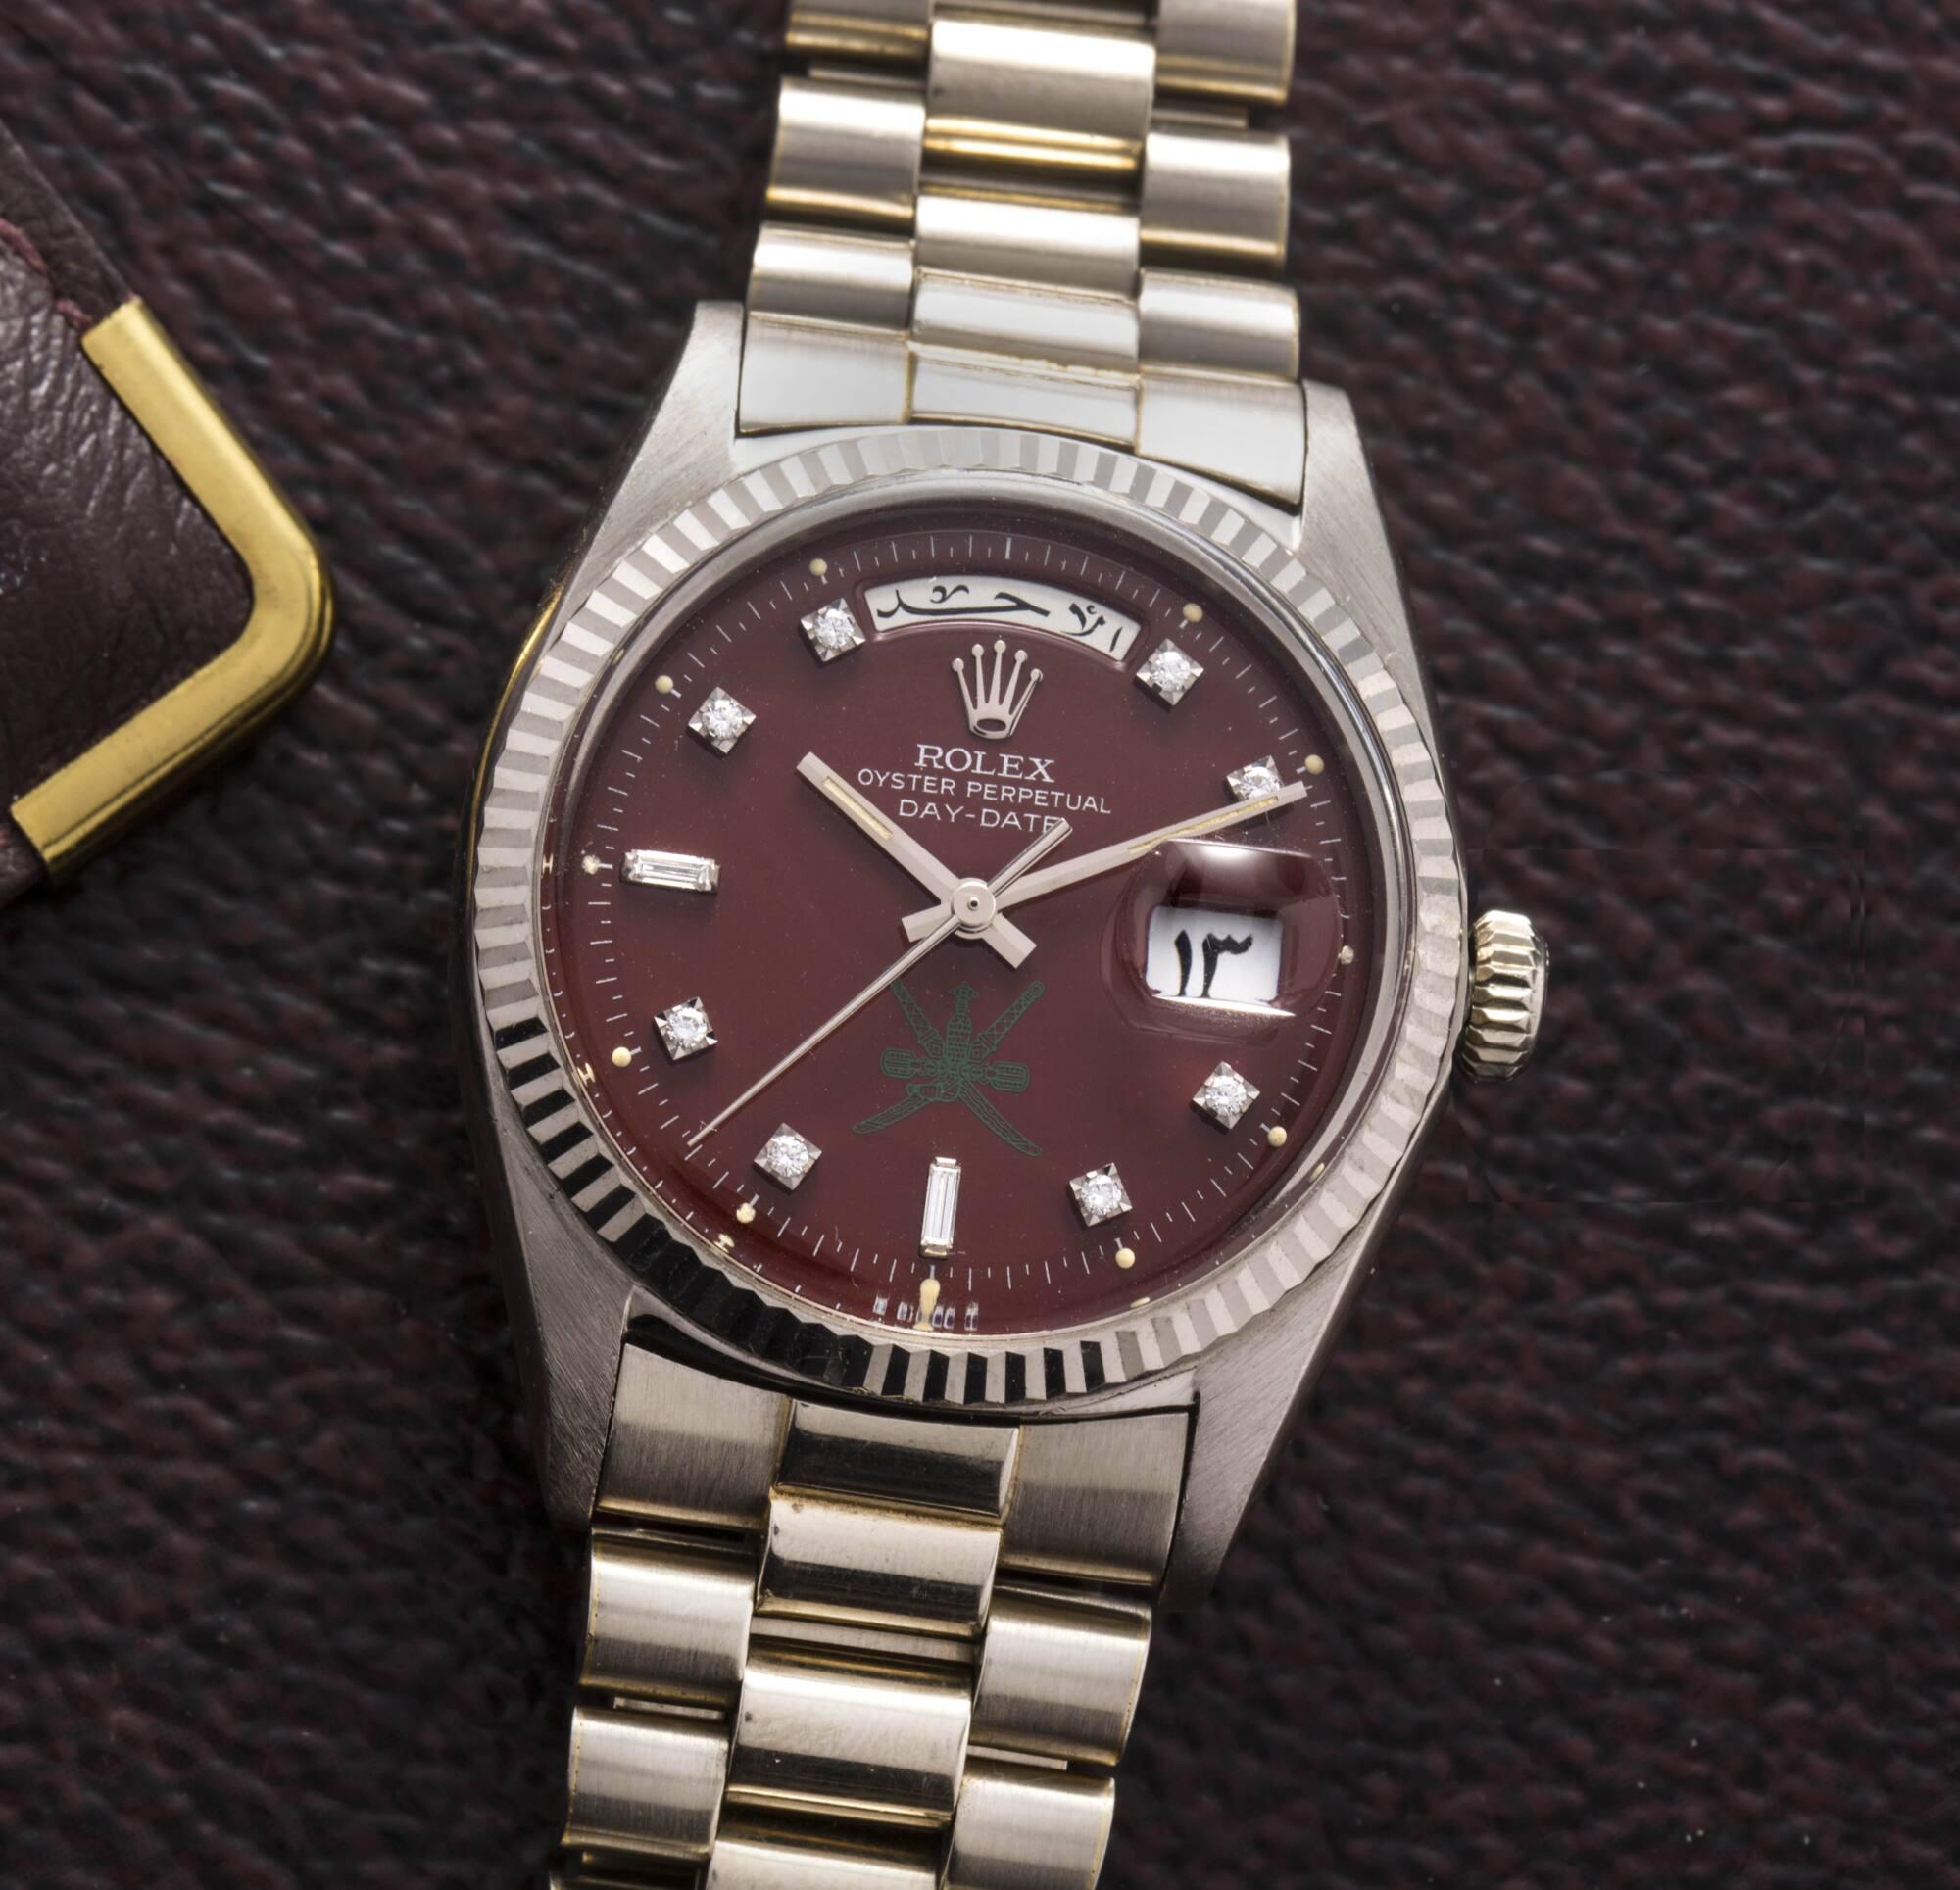 RESULTS | Christie's Watches Online: Dubai Edit Totals $5,592,000, - MondaniWeb